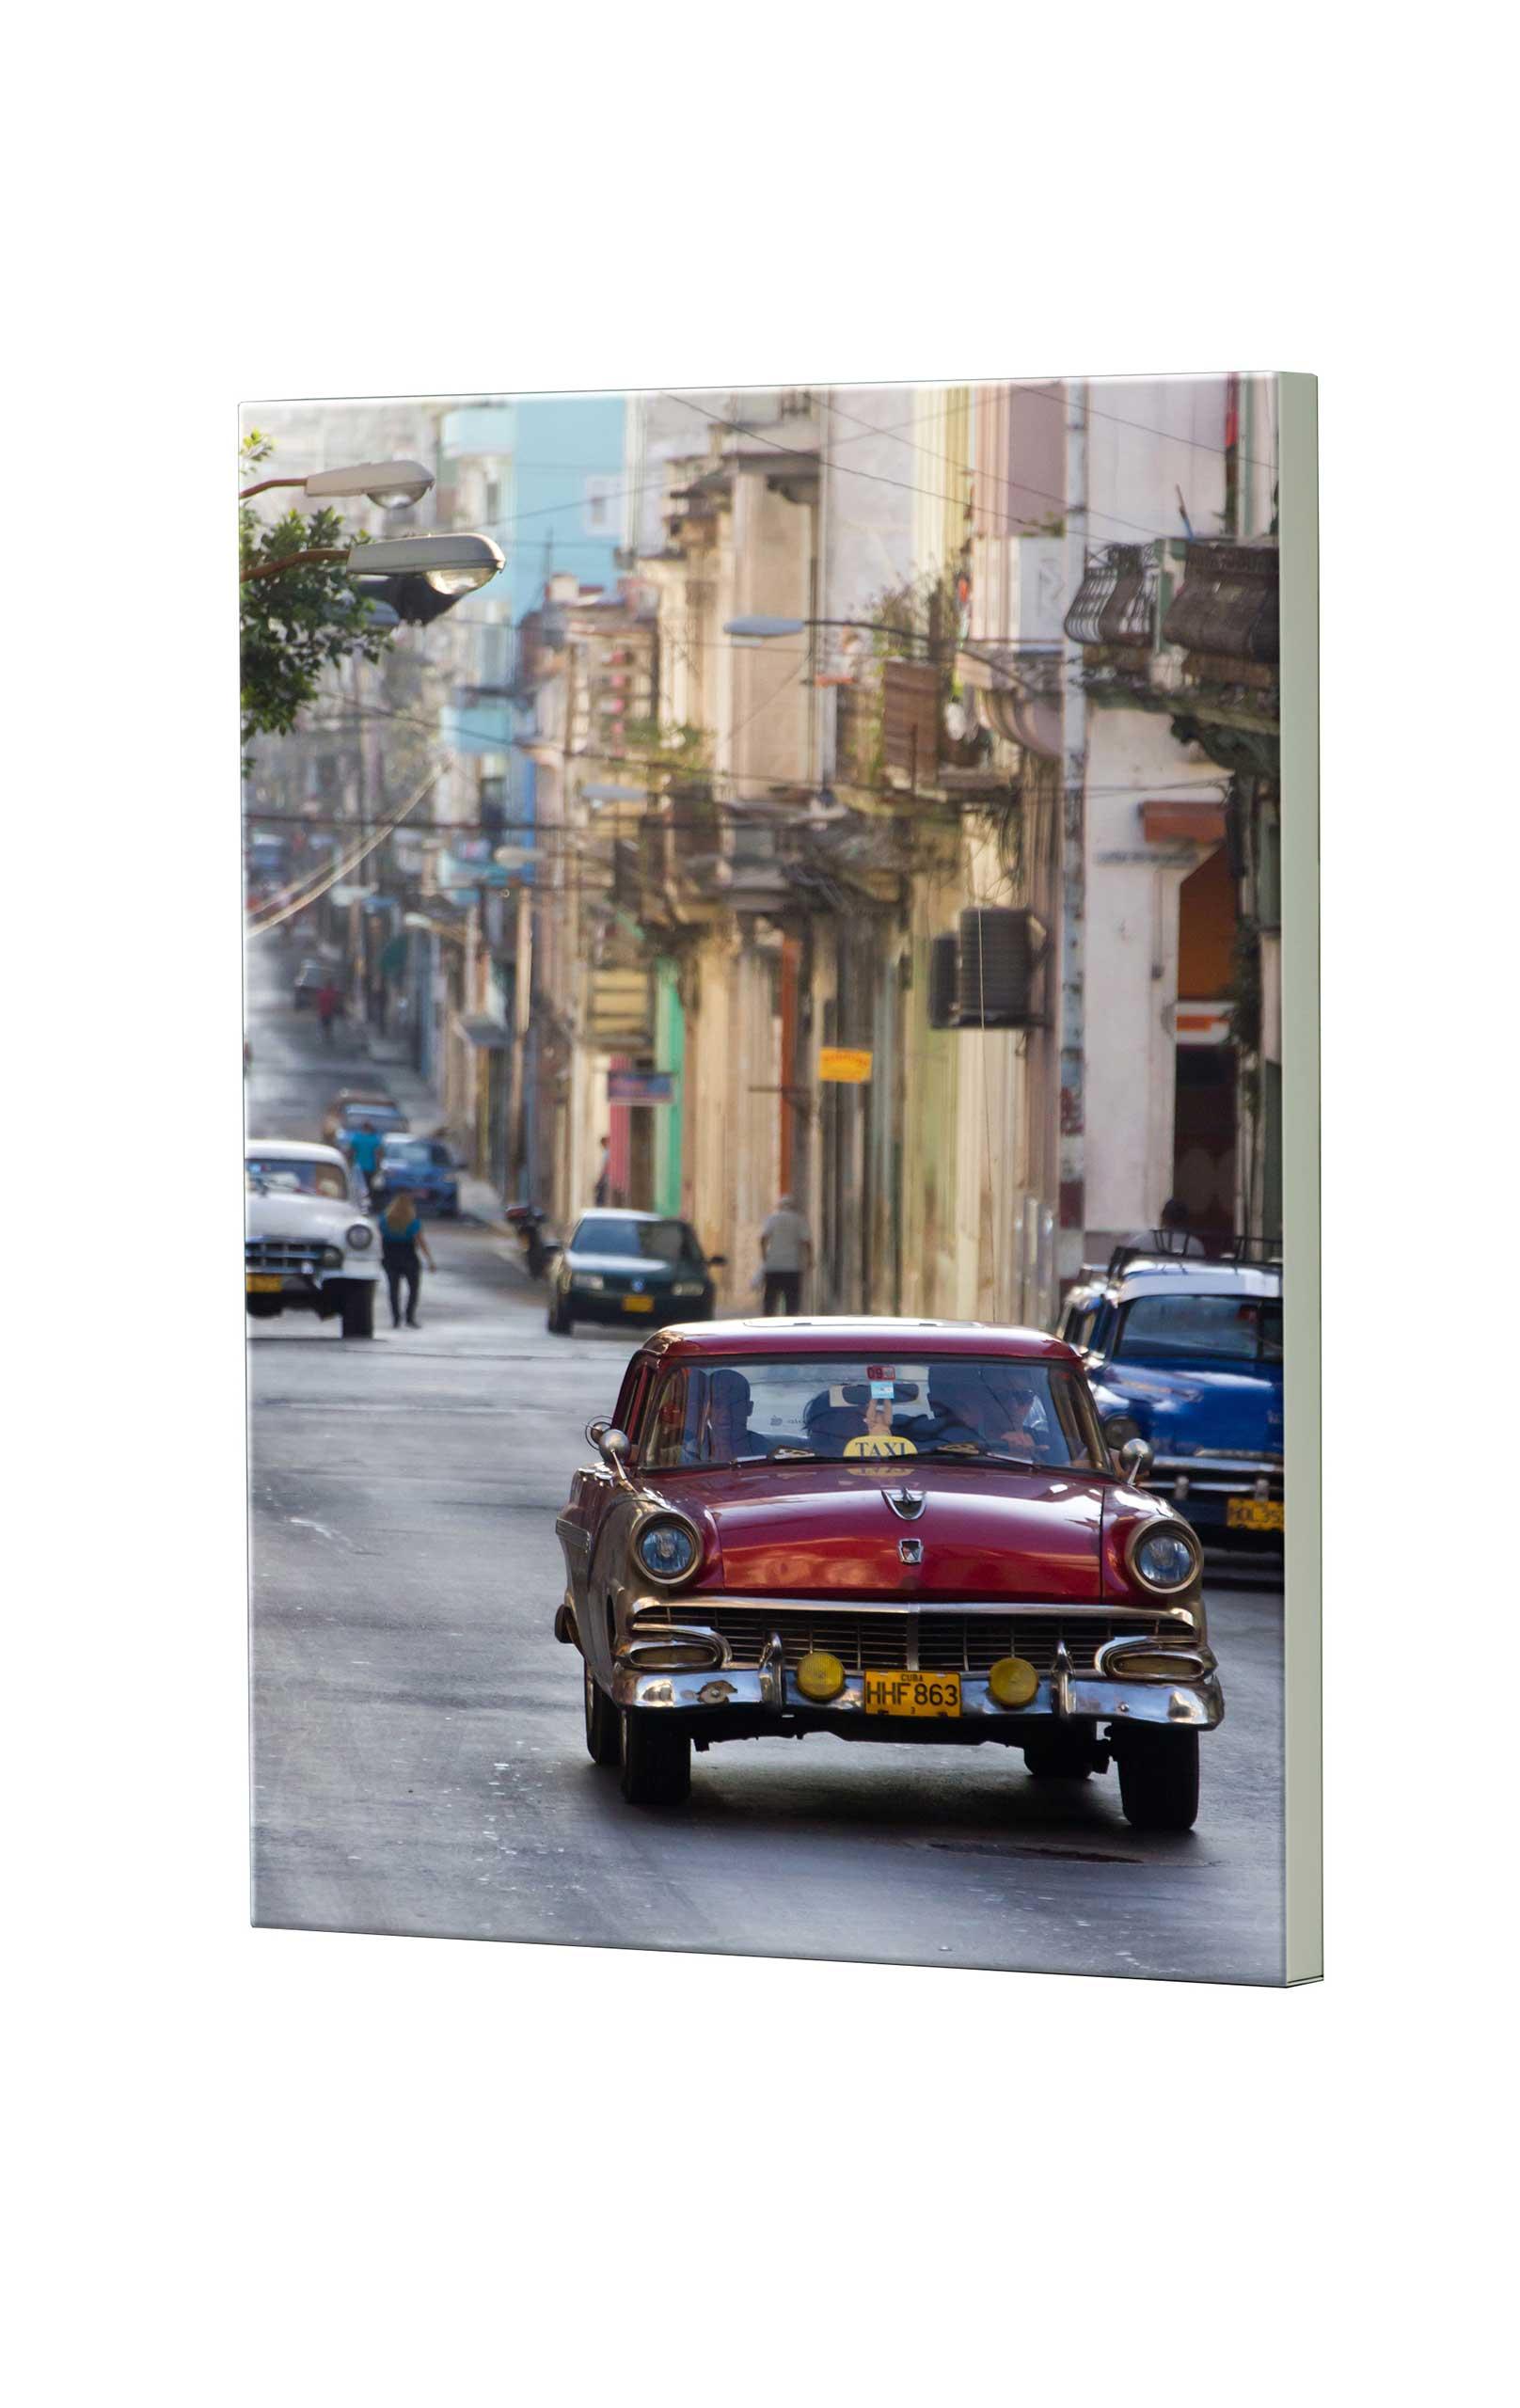 Magnettafel NOTIZ 60x80cm Motiv Cuba MDH141 Motiv-Pinnwand